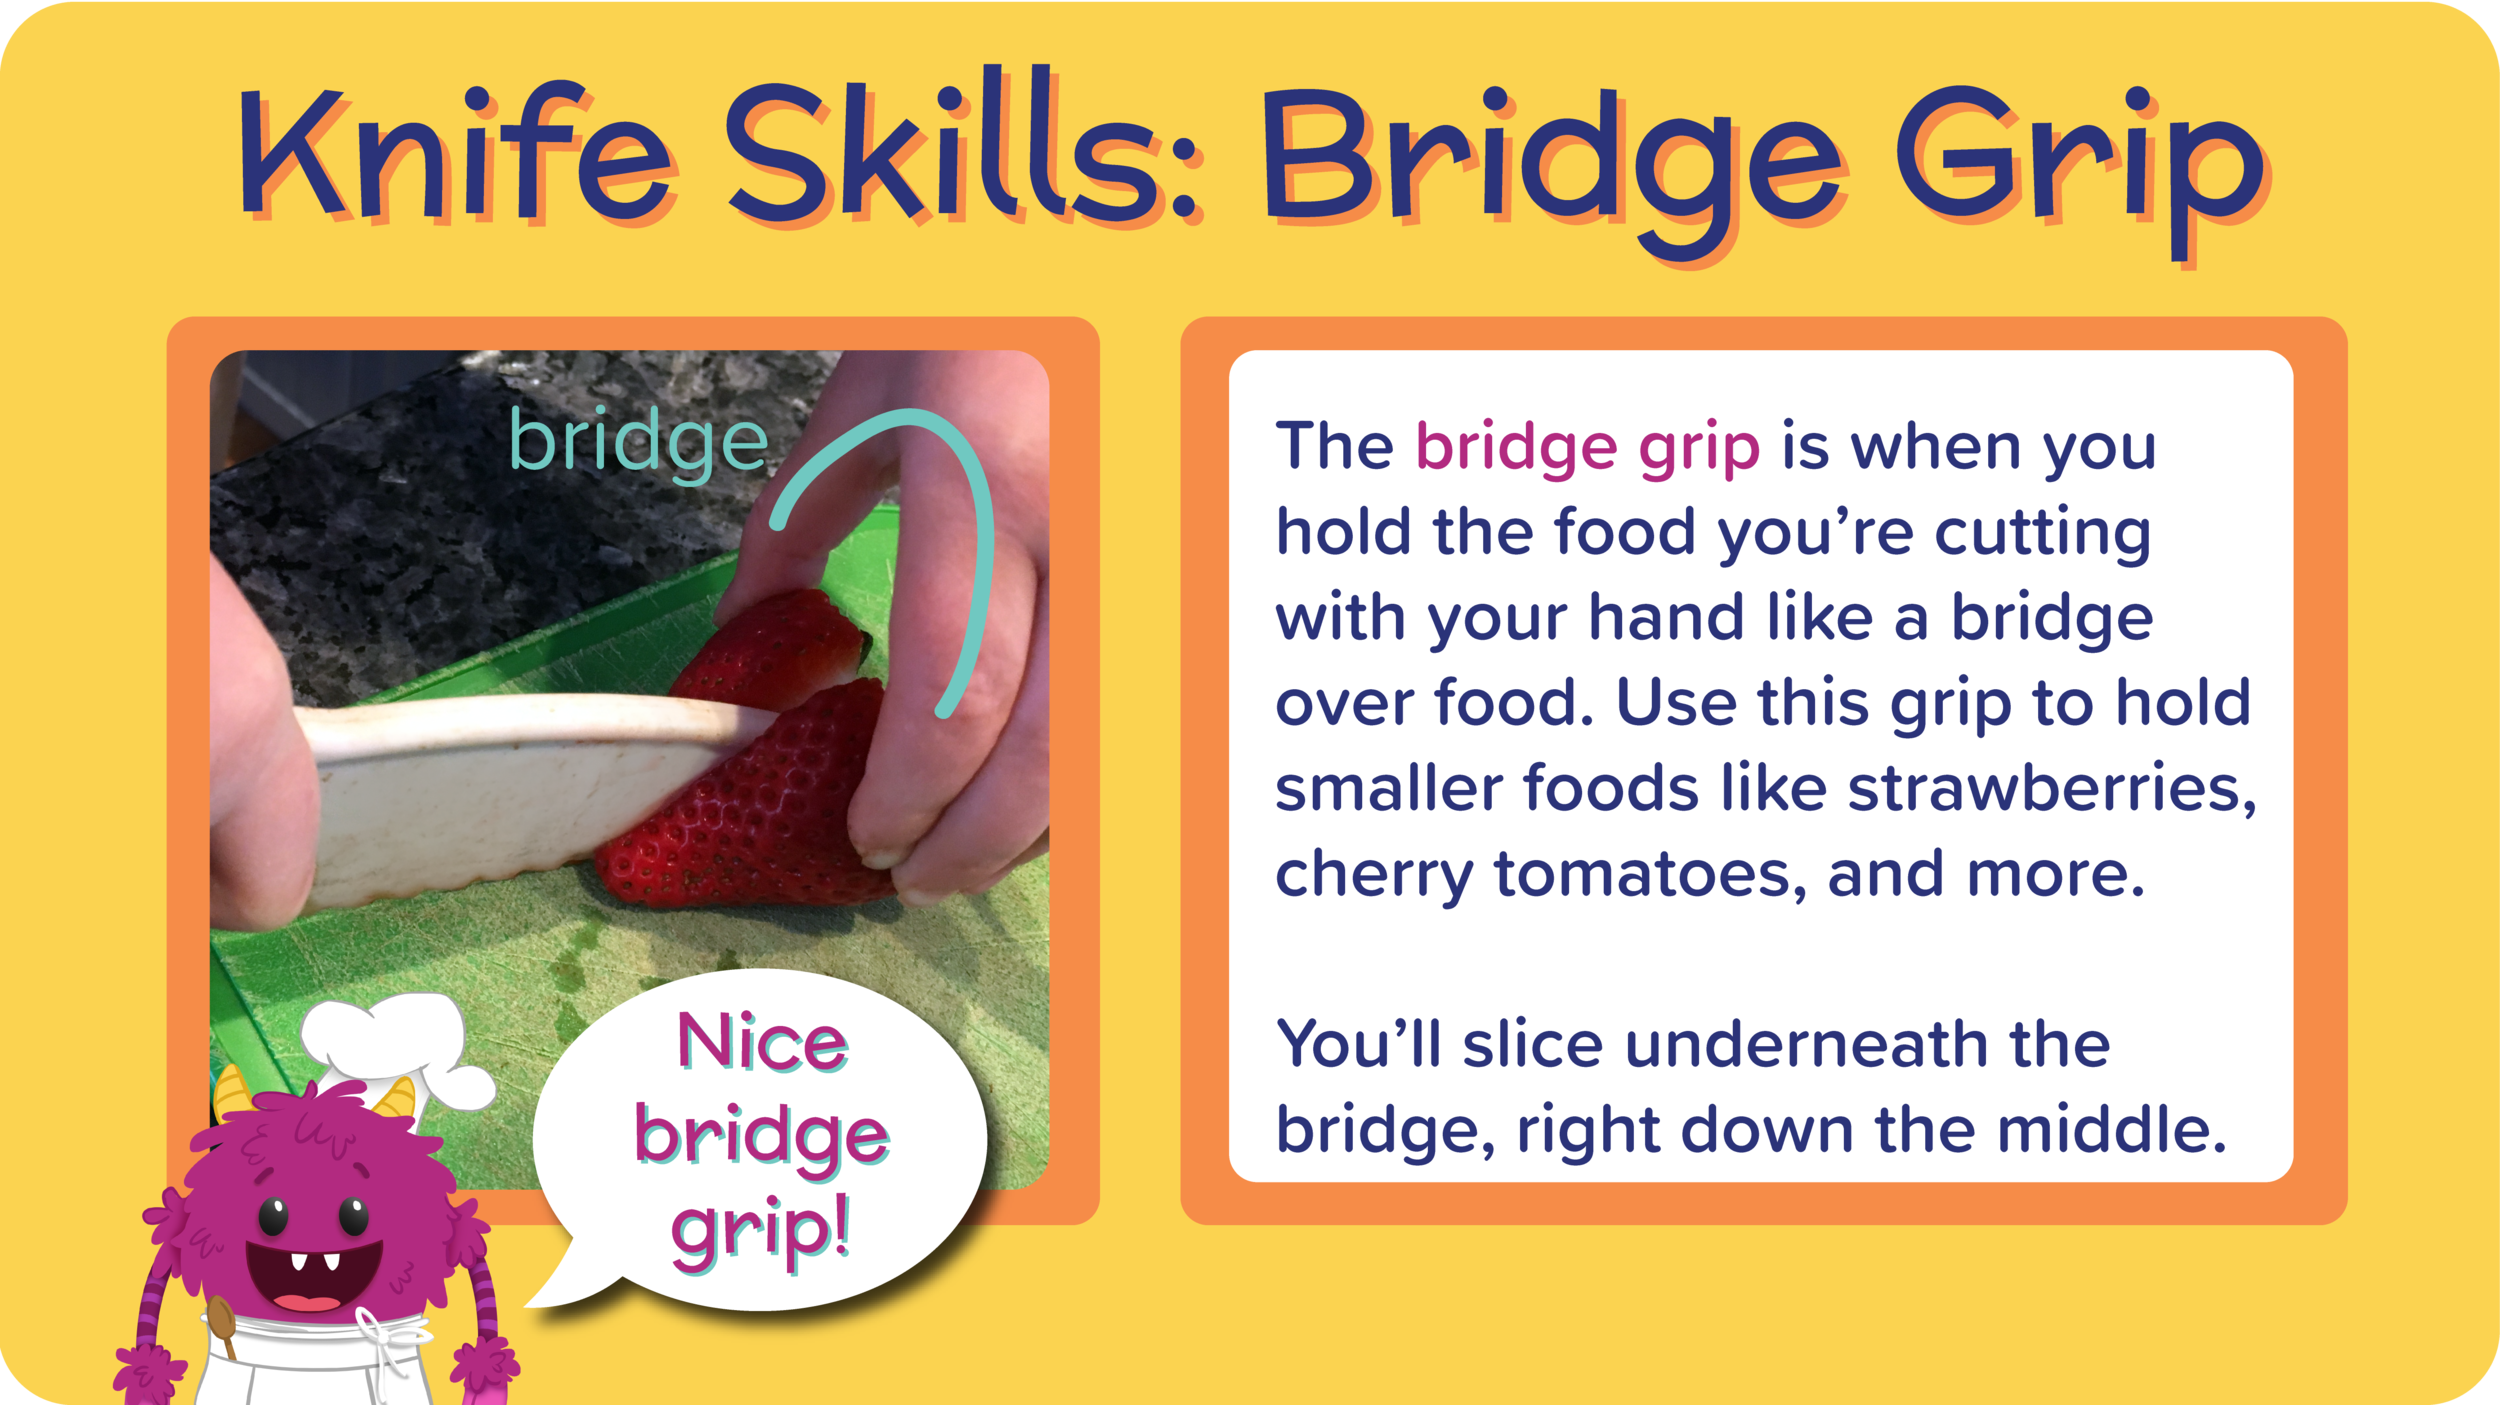 16_GreatGreenGuacamole_bridge grip-01.png